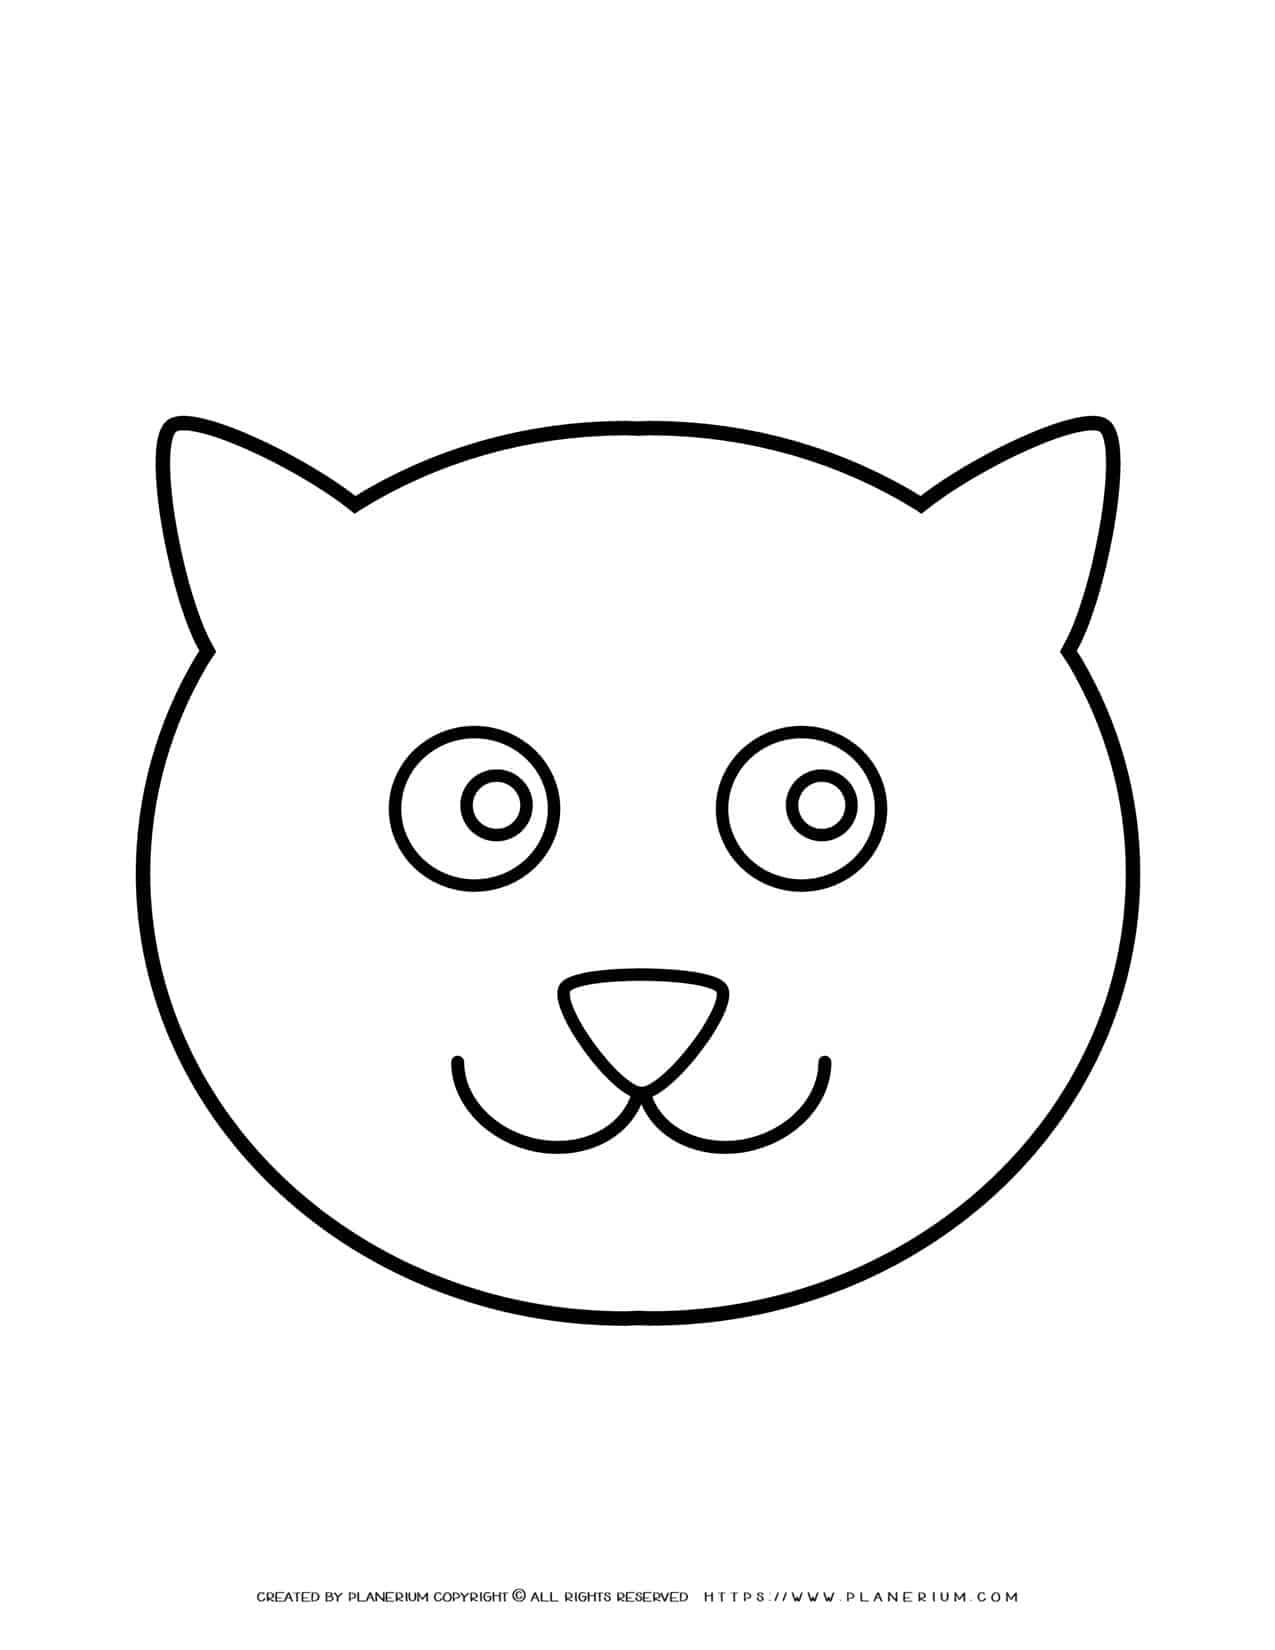 Cat Face Outline   Planerium